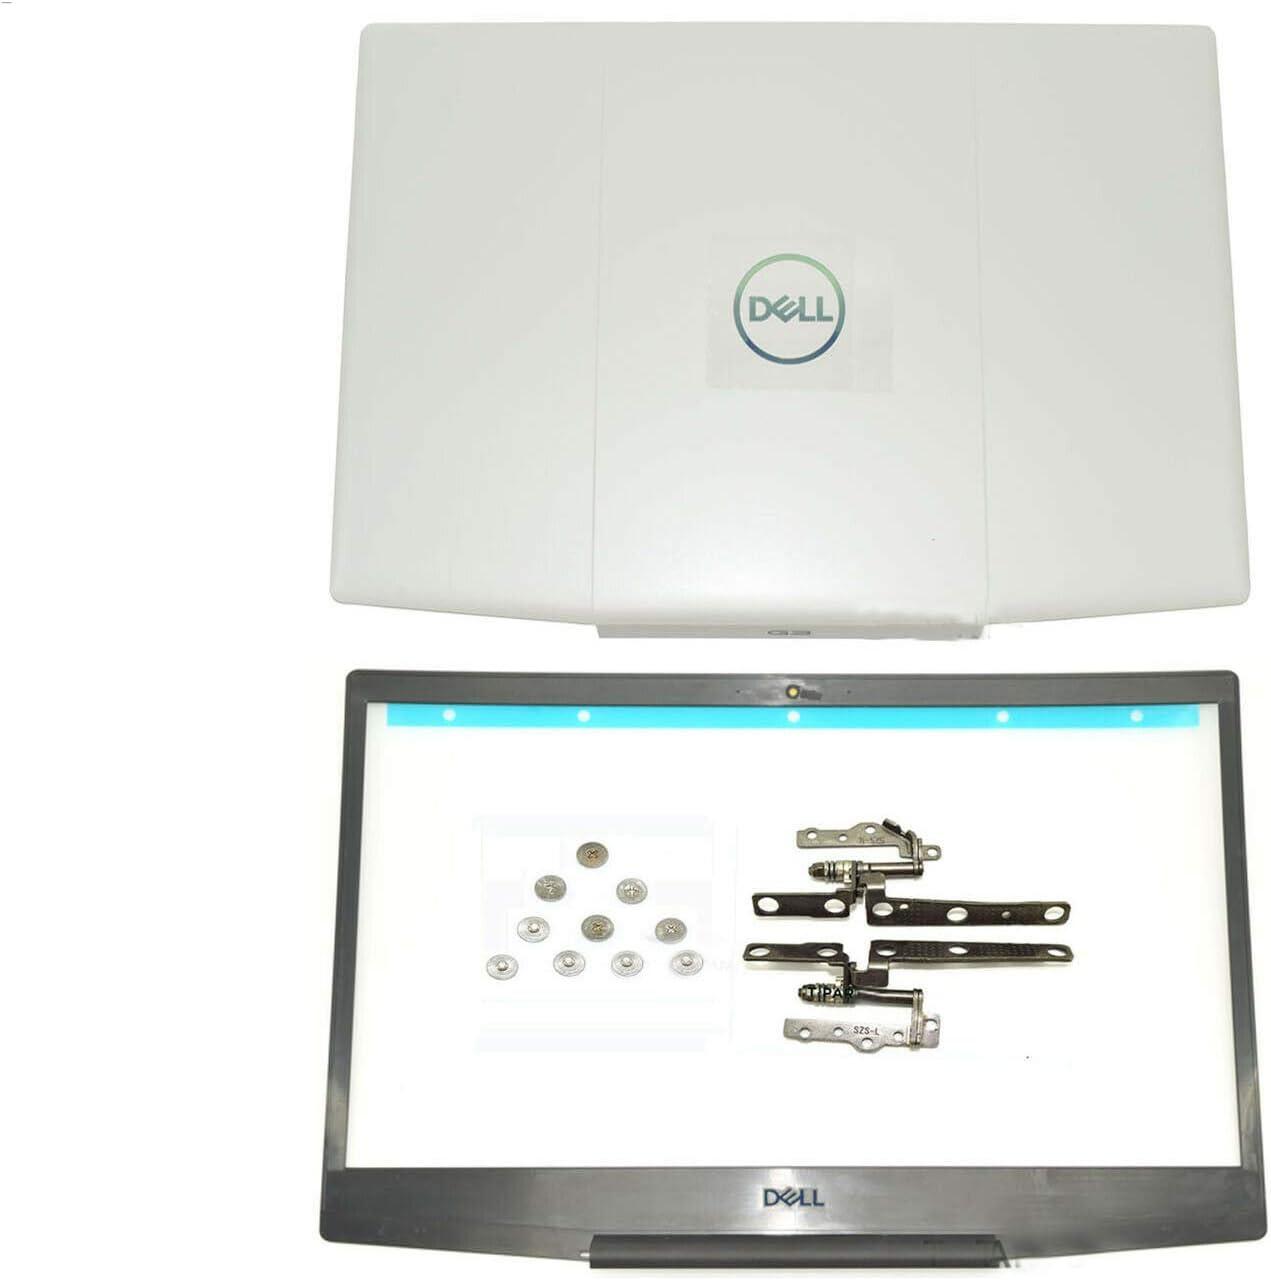 NODRLIN New for Dell Inspiron G3 15 3590 LCD Rear Back Cover & Bezel & Hinge & Screws White 03HKFN 3HKFN, 03HKFN 3HKFN 07MD2F 7MD2F